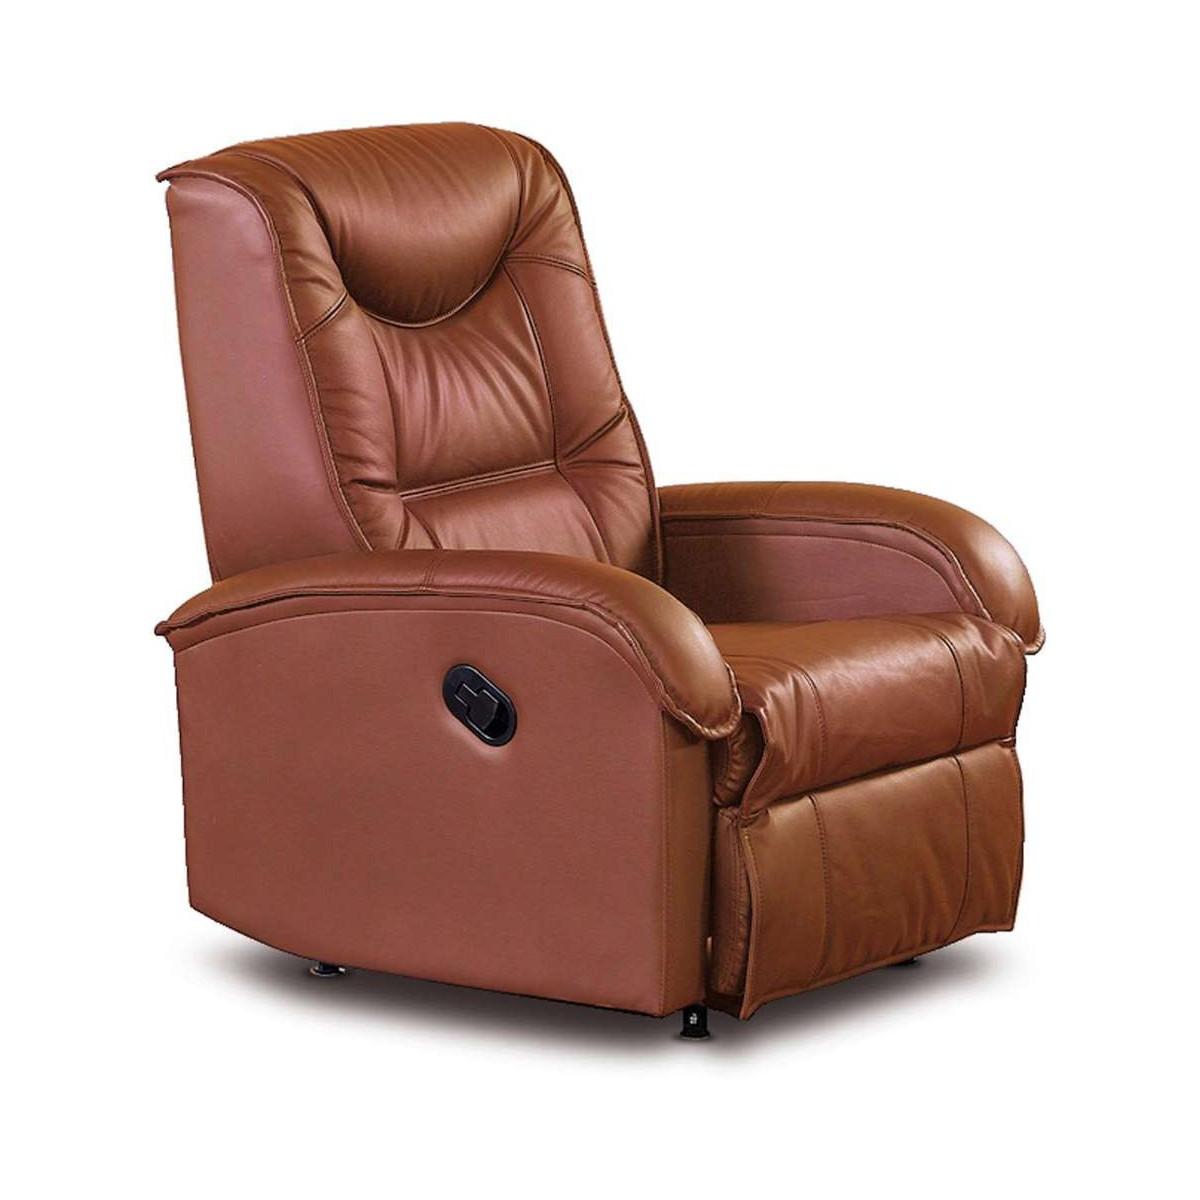 Jeff brązowy fotel relaks